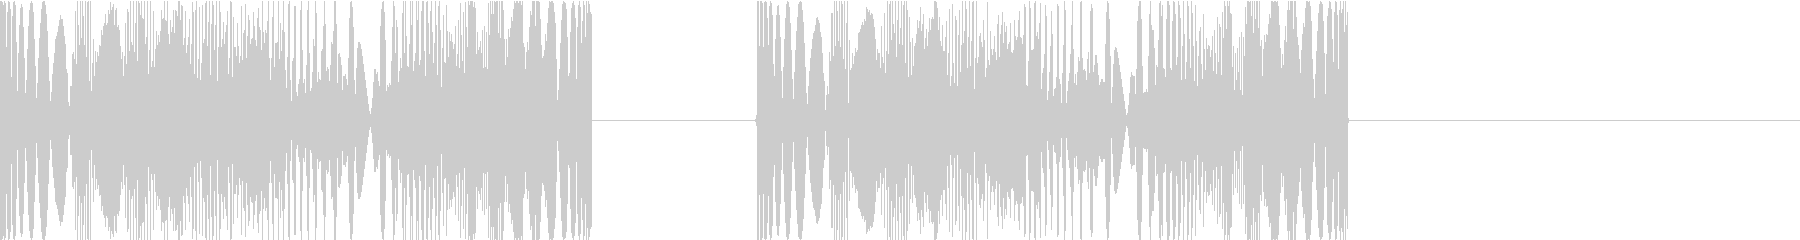 DJプレイ スクラッチ・ノイズ 295の未再生の波形